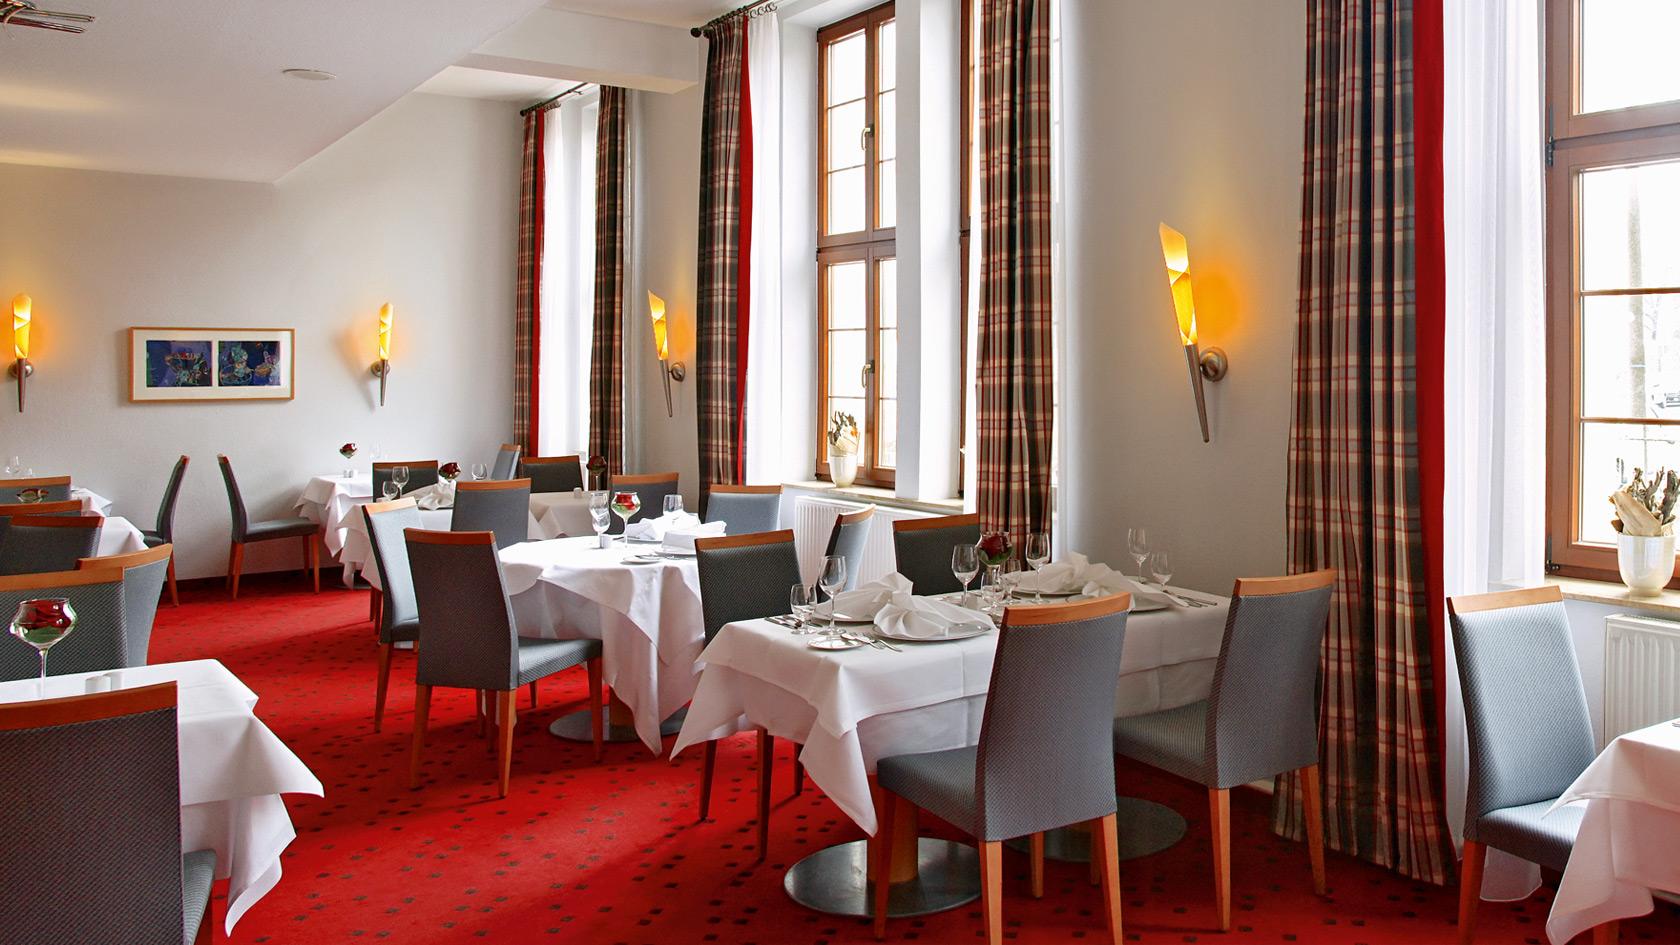 restaurant michaelis leipzig restaurantf hrer gusto. Black Bedroom Furniture Sets. Home Design Ideas